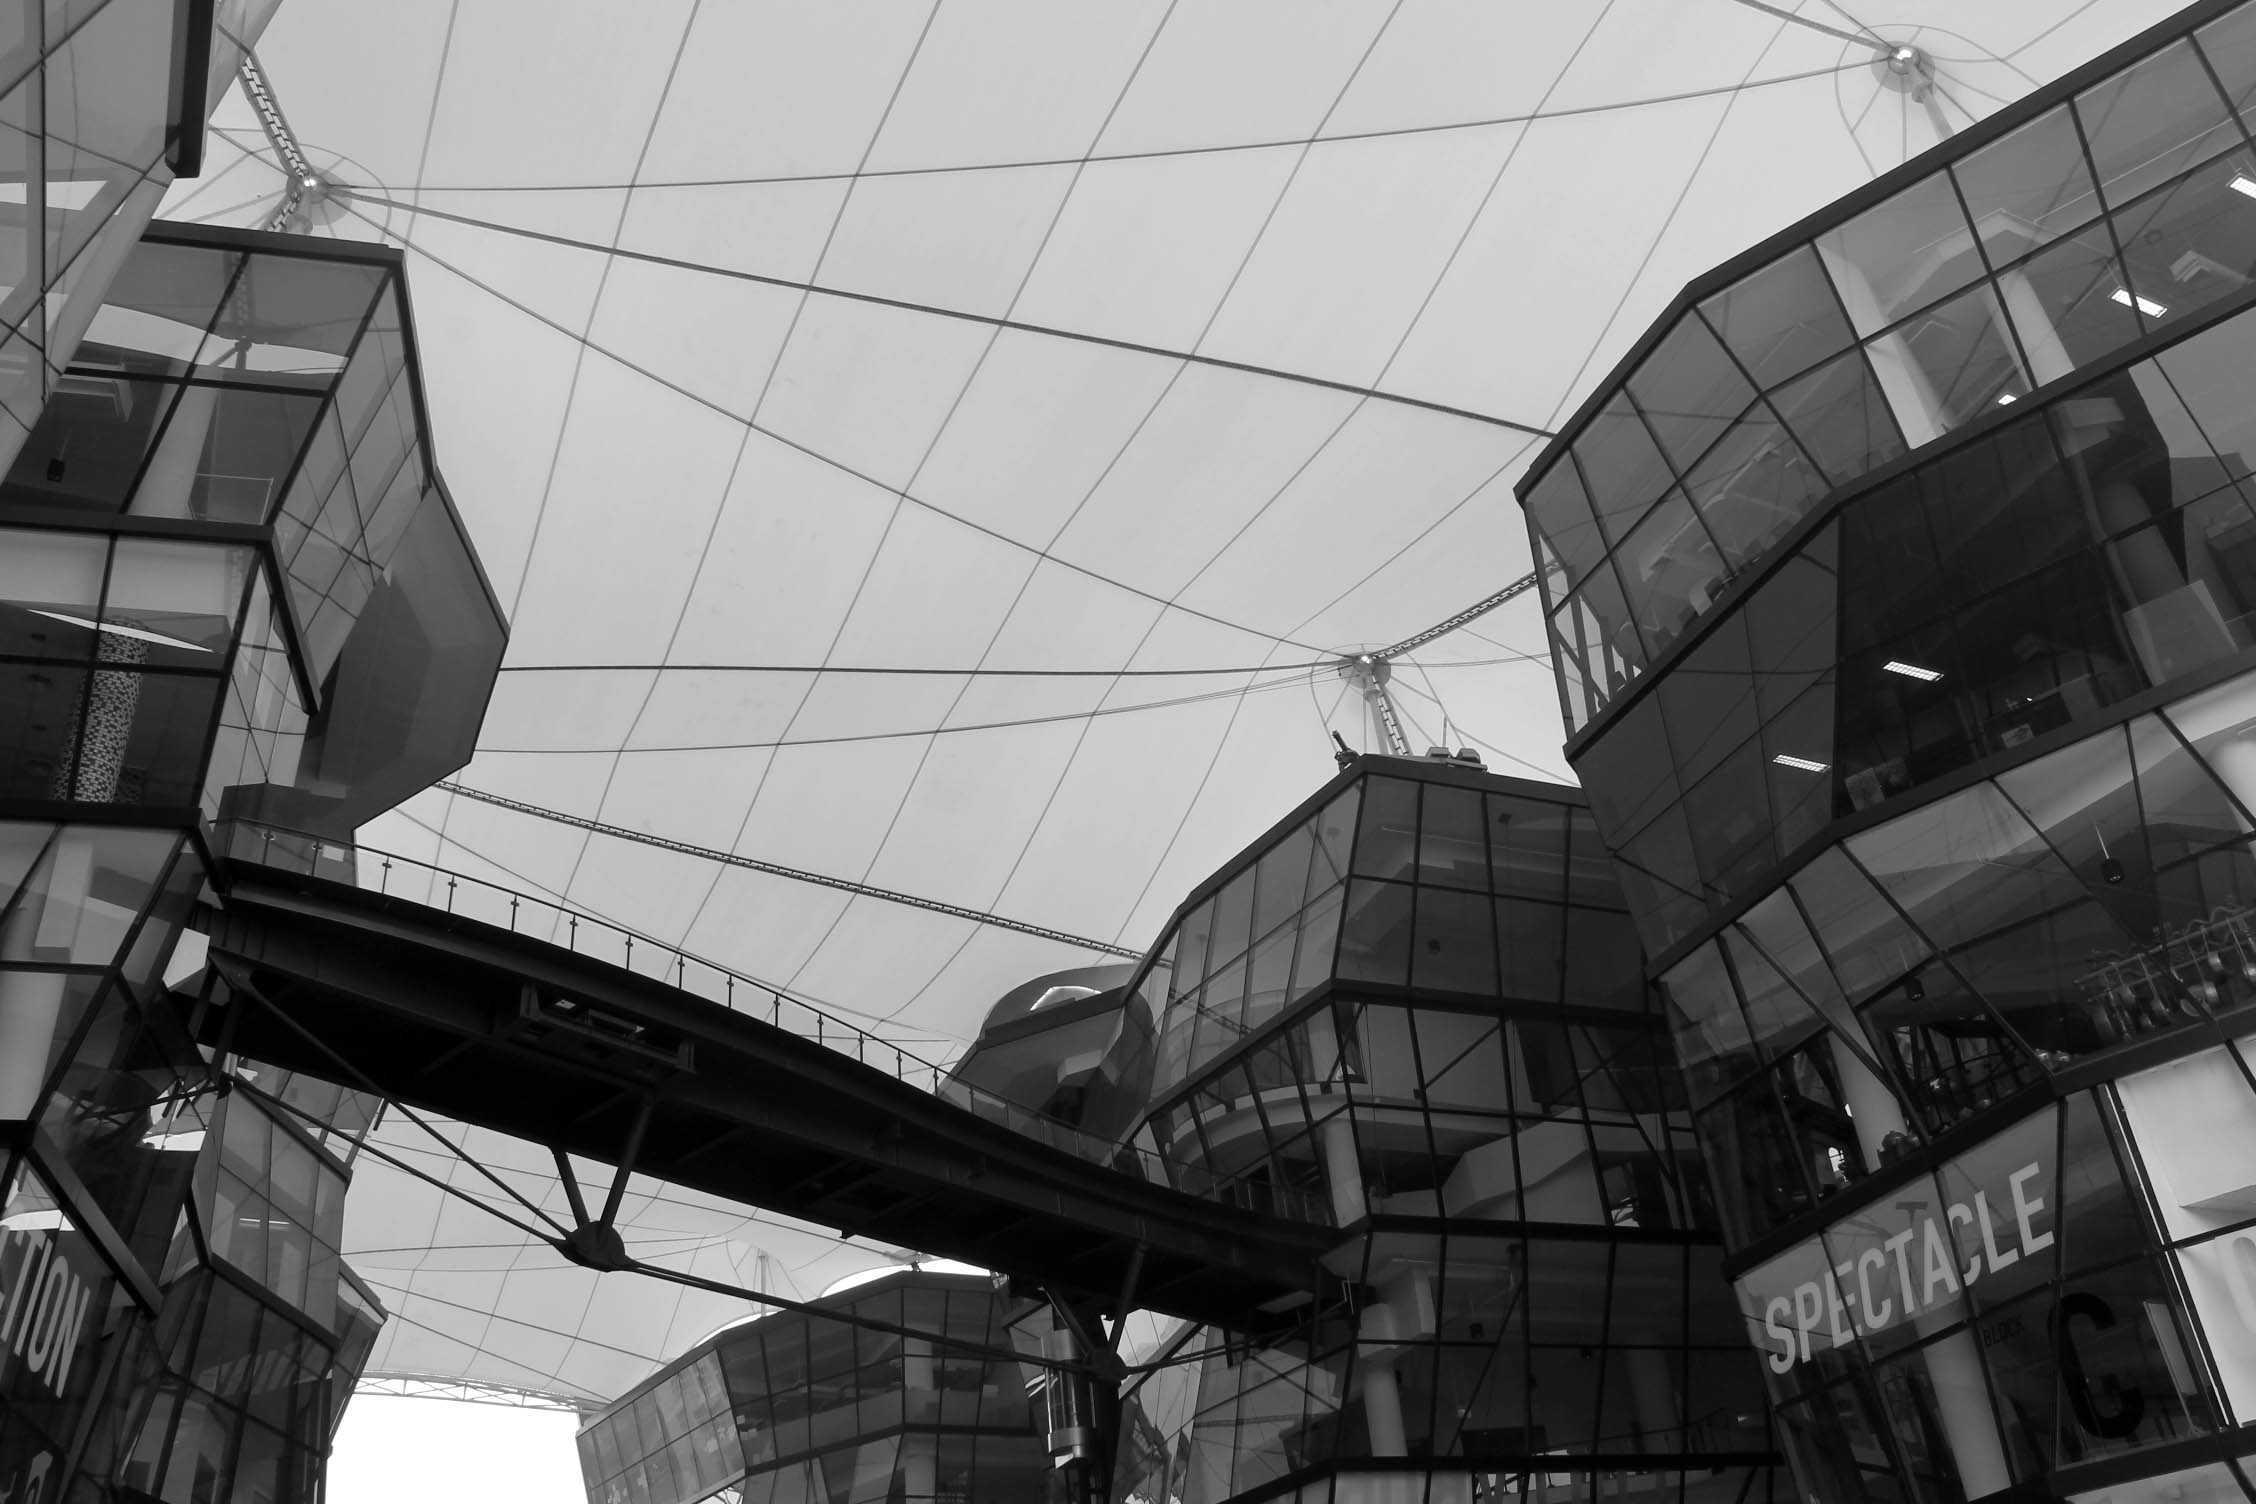 Rully Tanuwidjaja The New City Campus Lasalle-Sia Singapura Singapura The 'sail' Membrane Roofing Kontemporer  48058